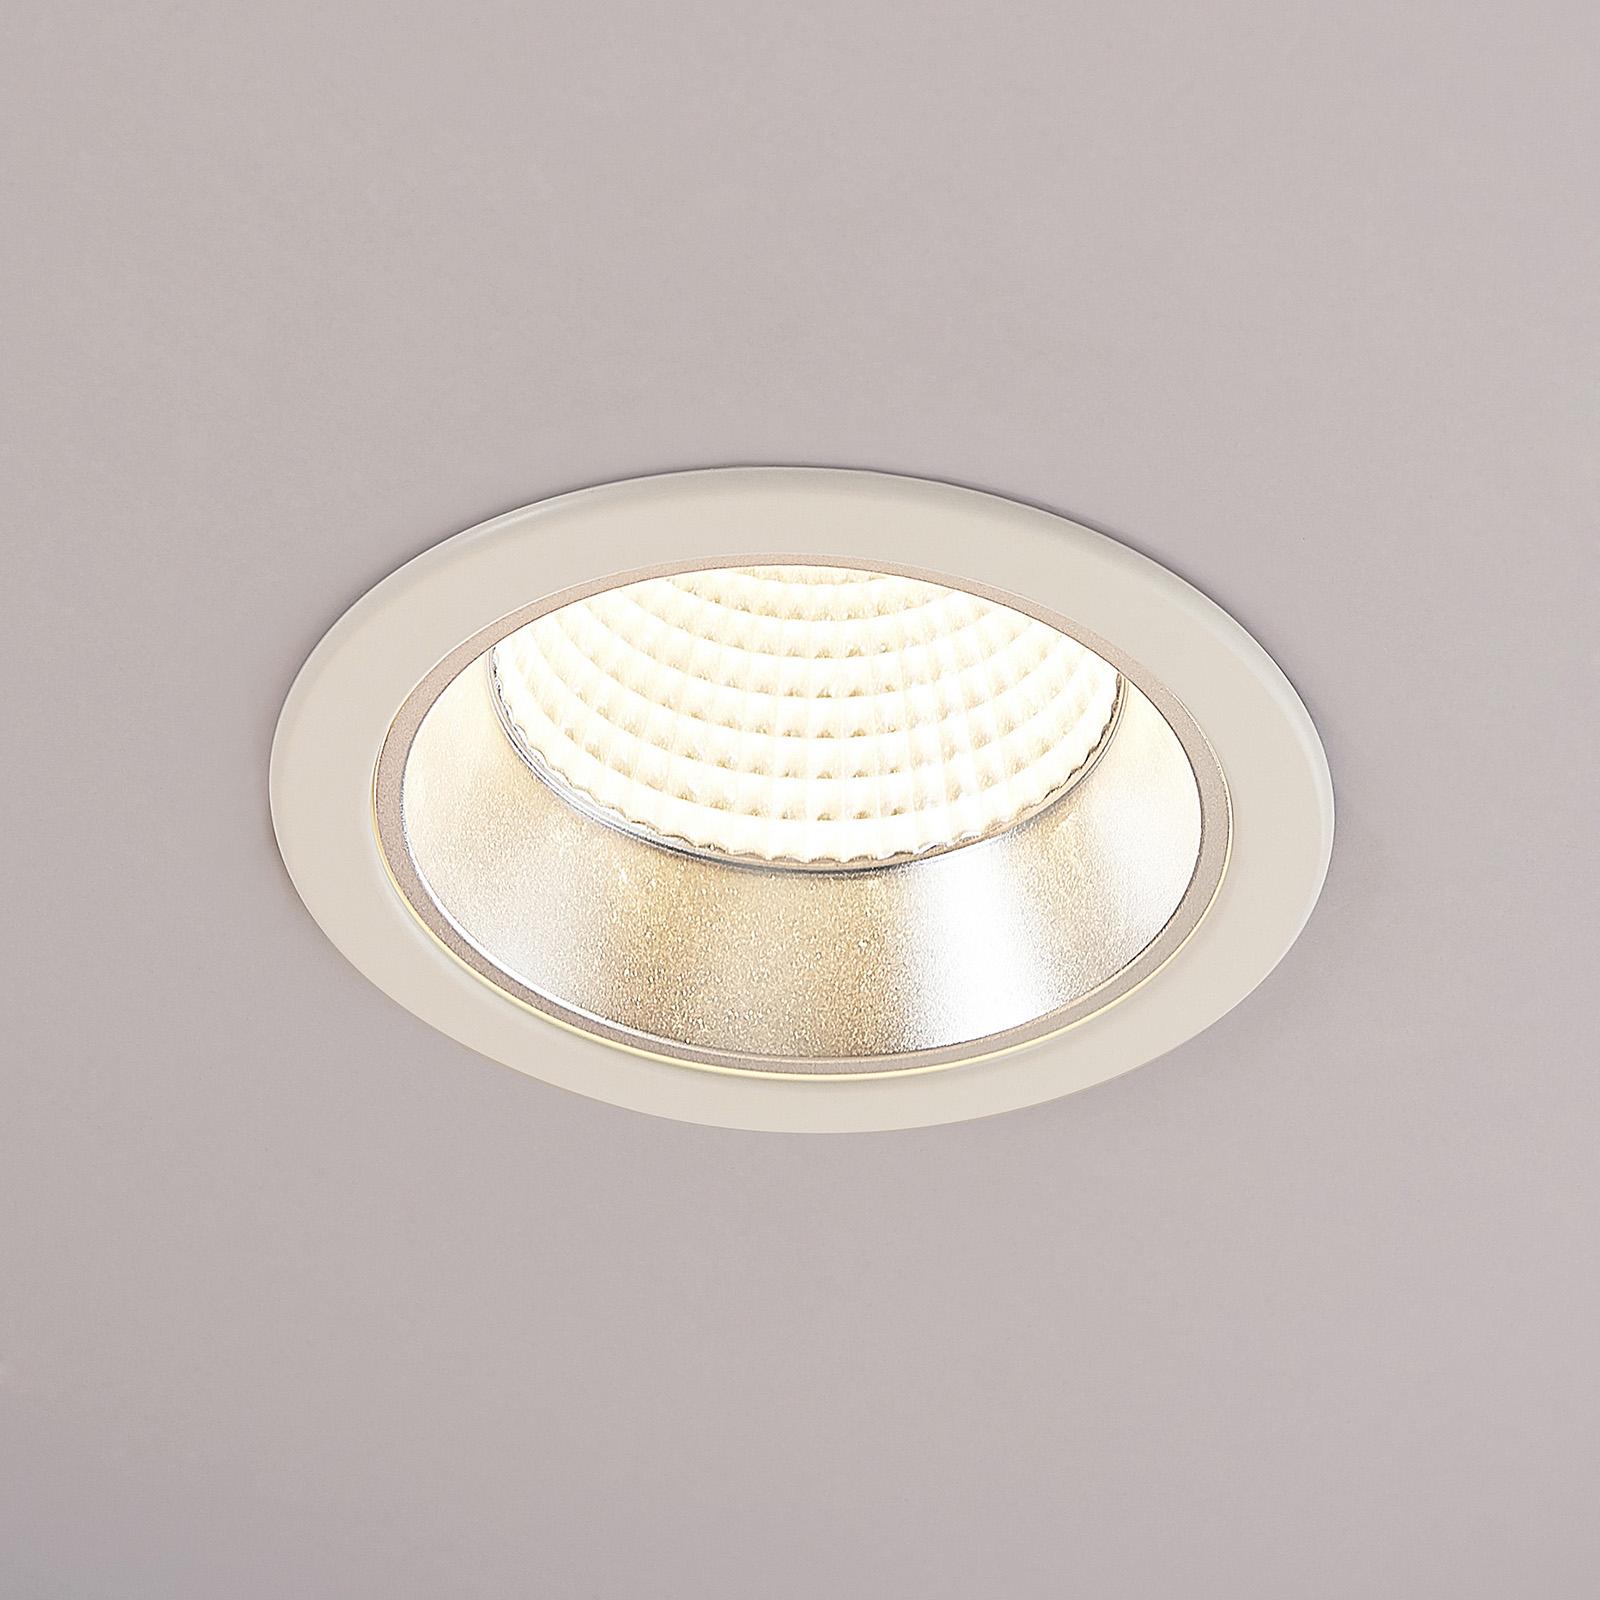 arcchio delano led recessed spotlight lights co uk